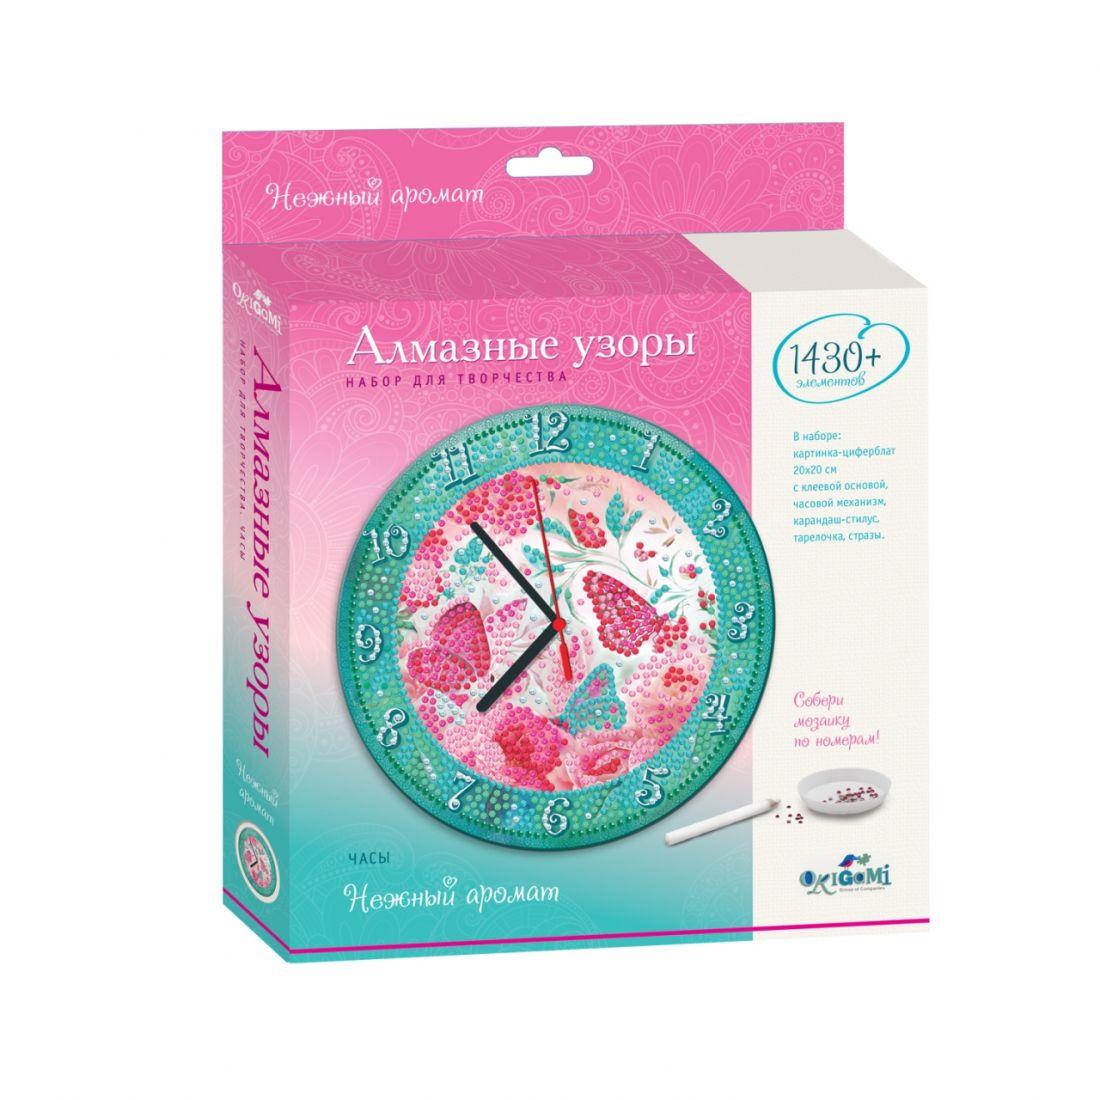 Набор для творчества ORIGAMI 04736 Алмазные узоры.Часы нежный аромат